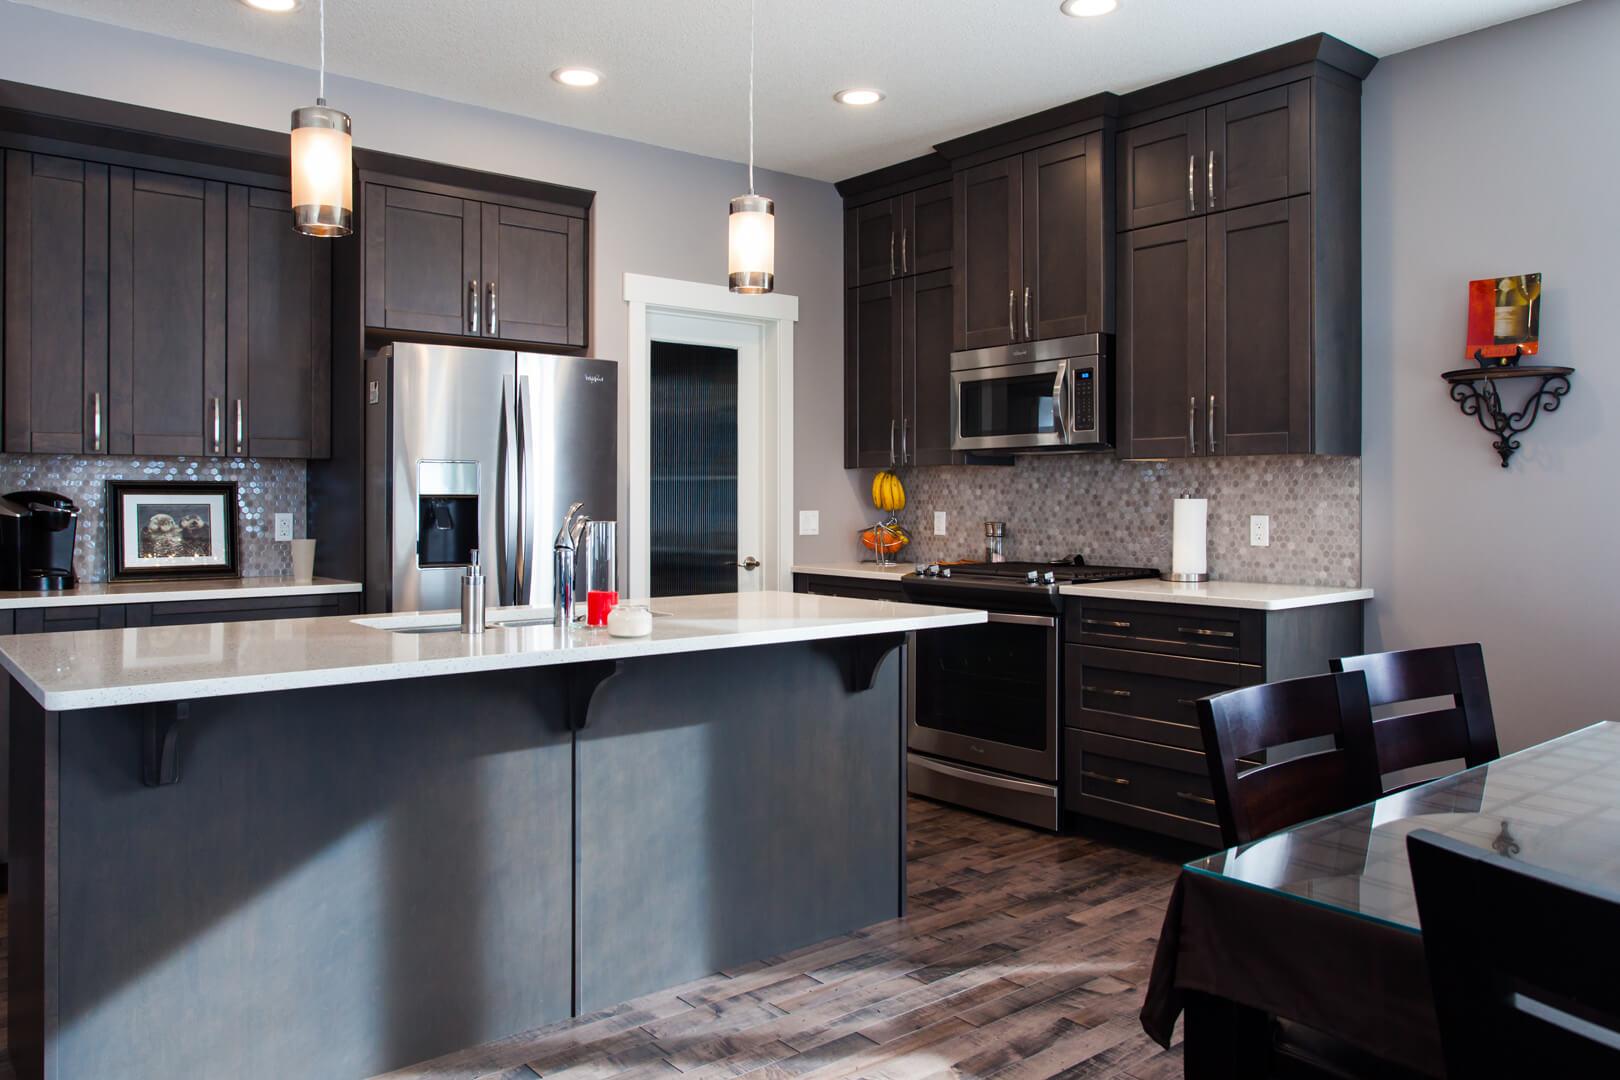 baldry-rococo-homes-kitchen